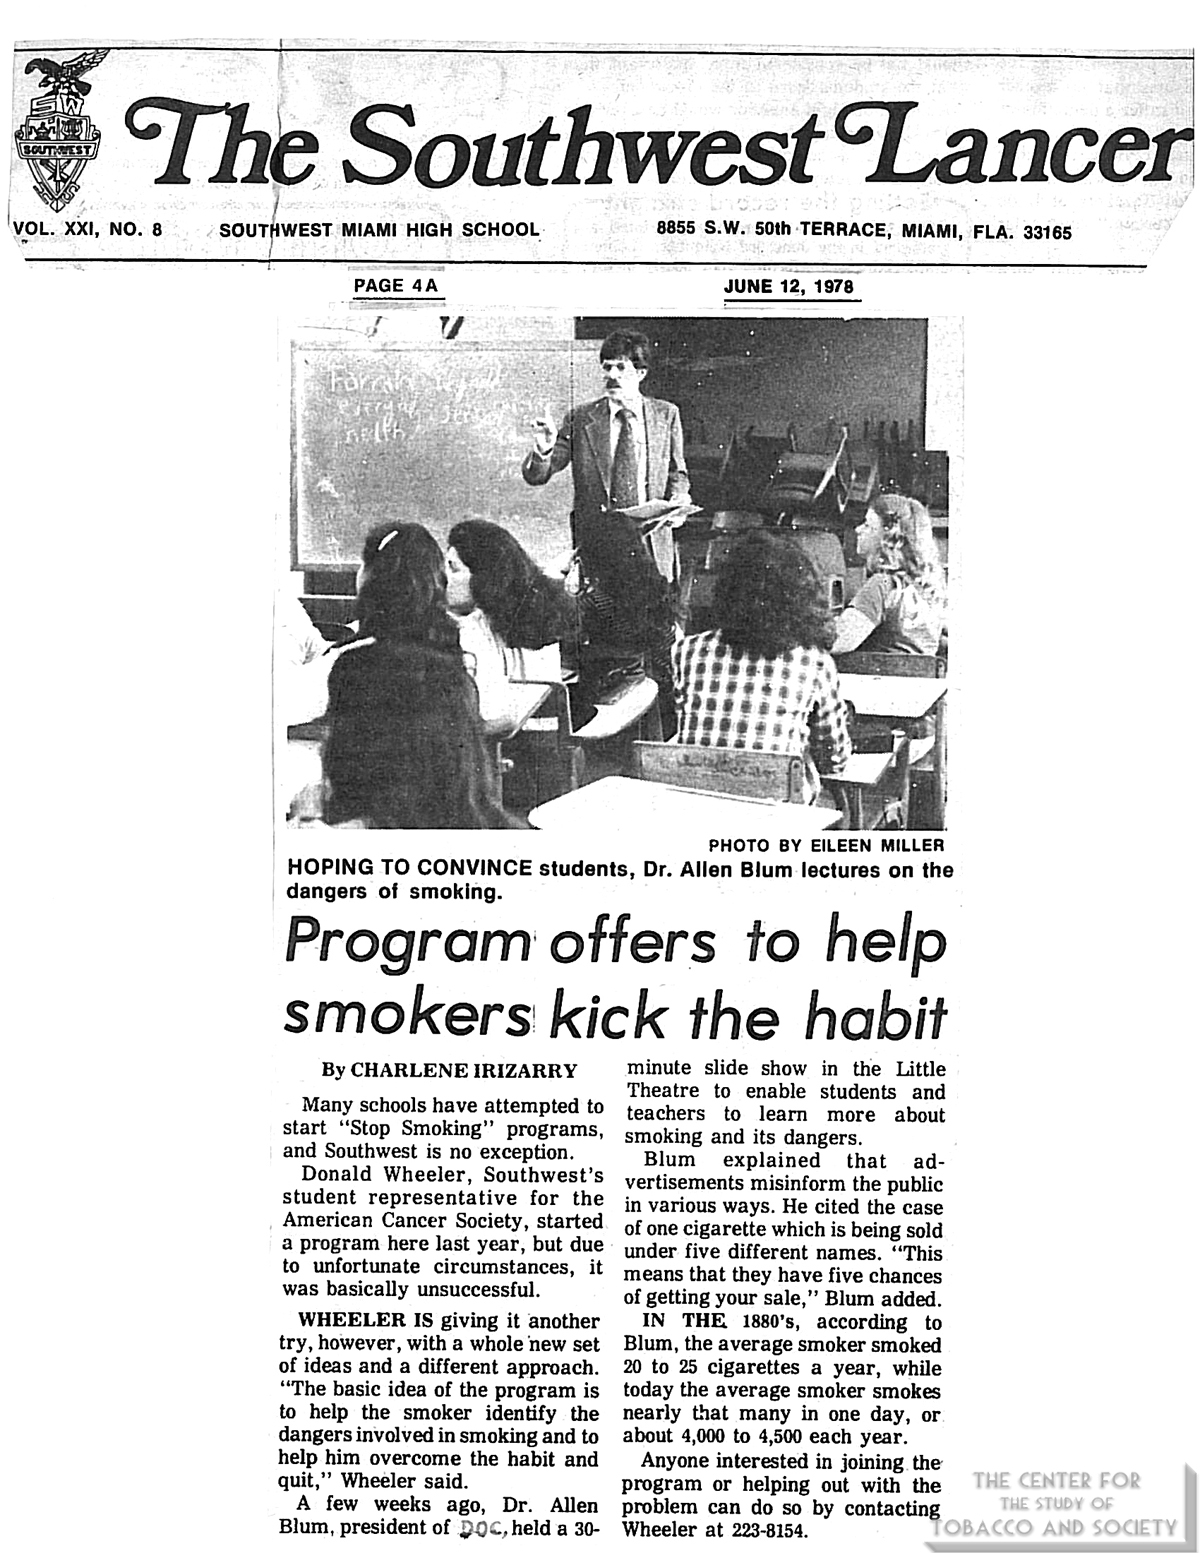 1978 06 12 Southwest Lancer Program Offers to Help Smokers Kick Habit